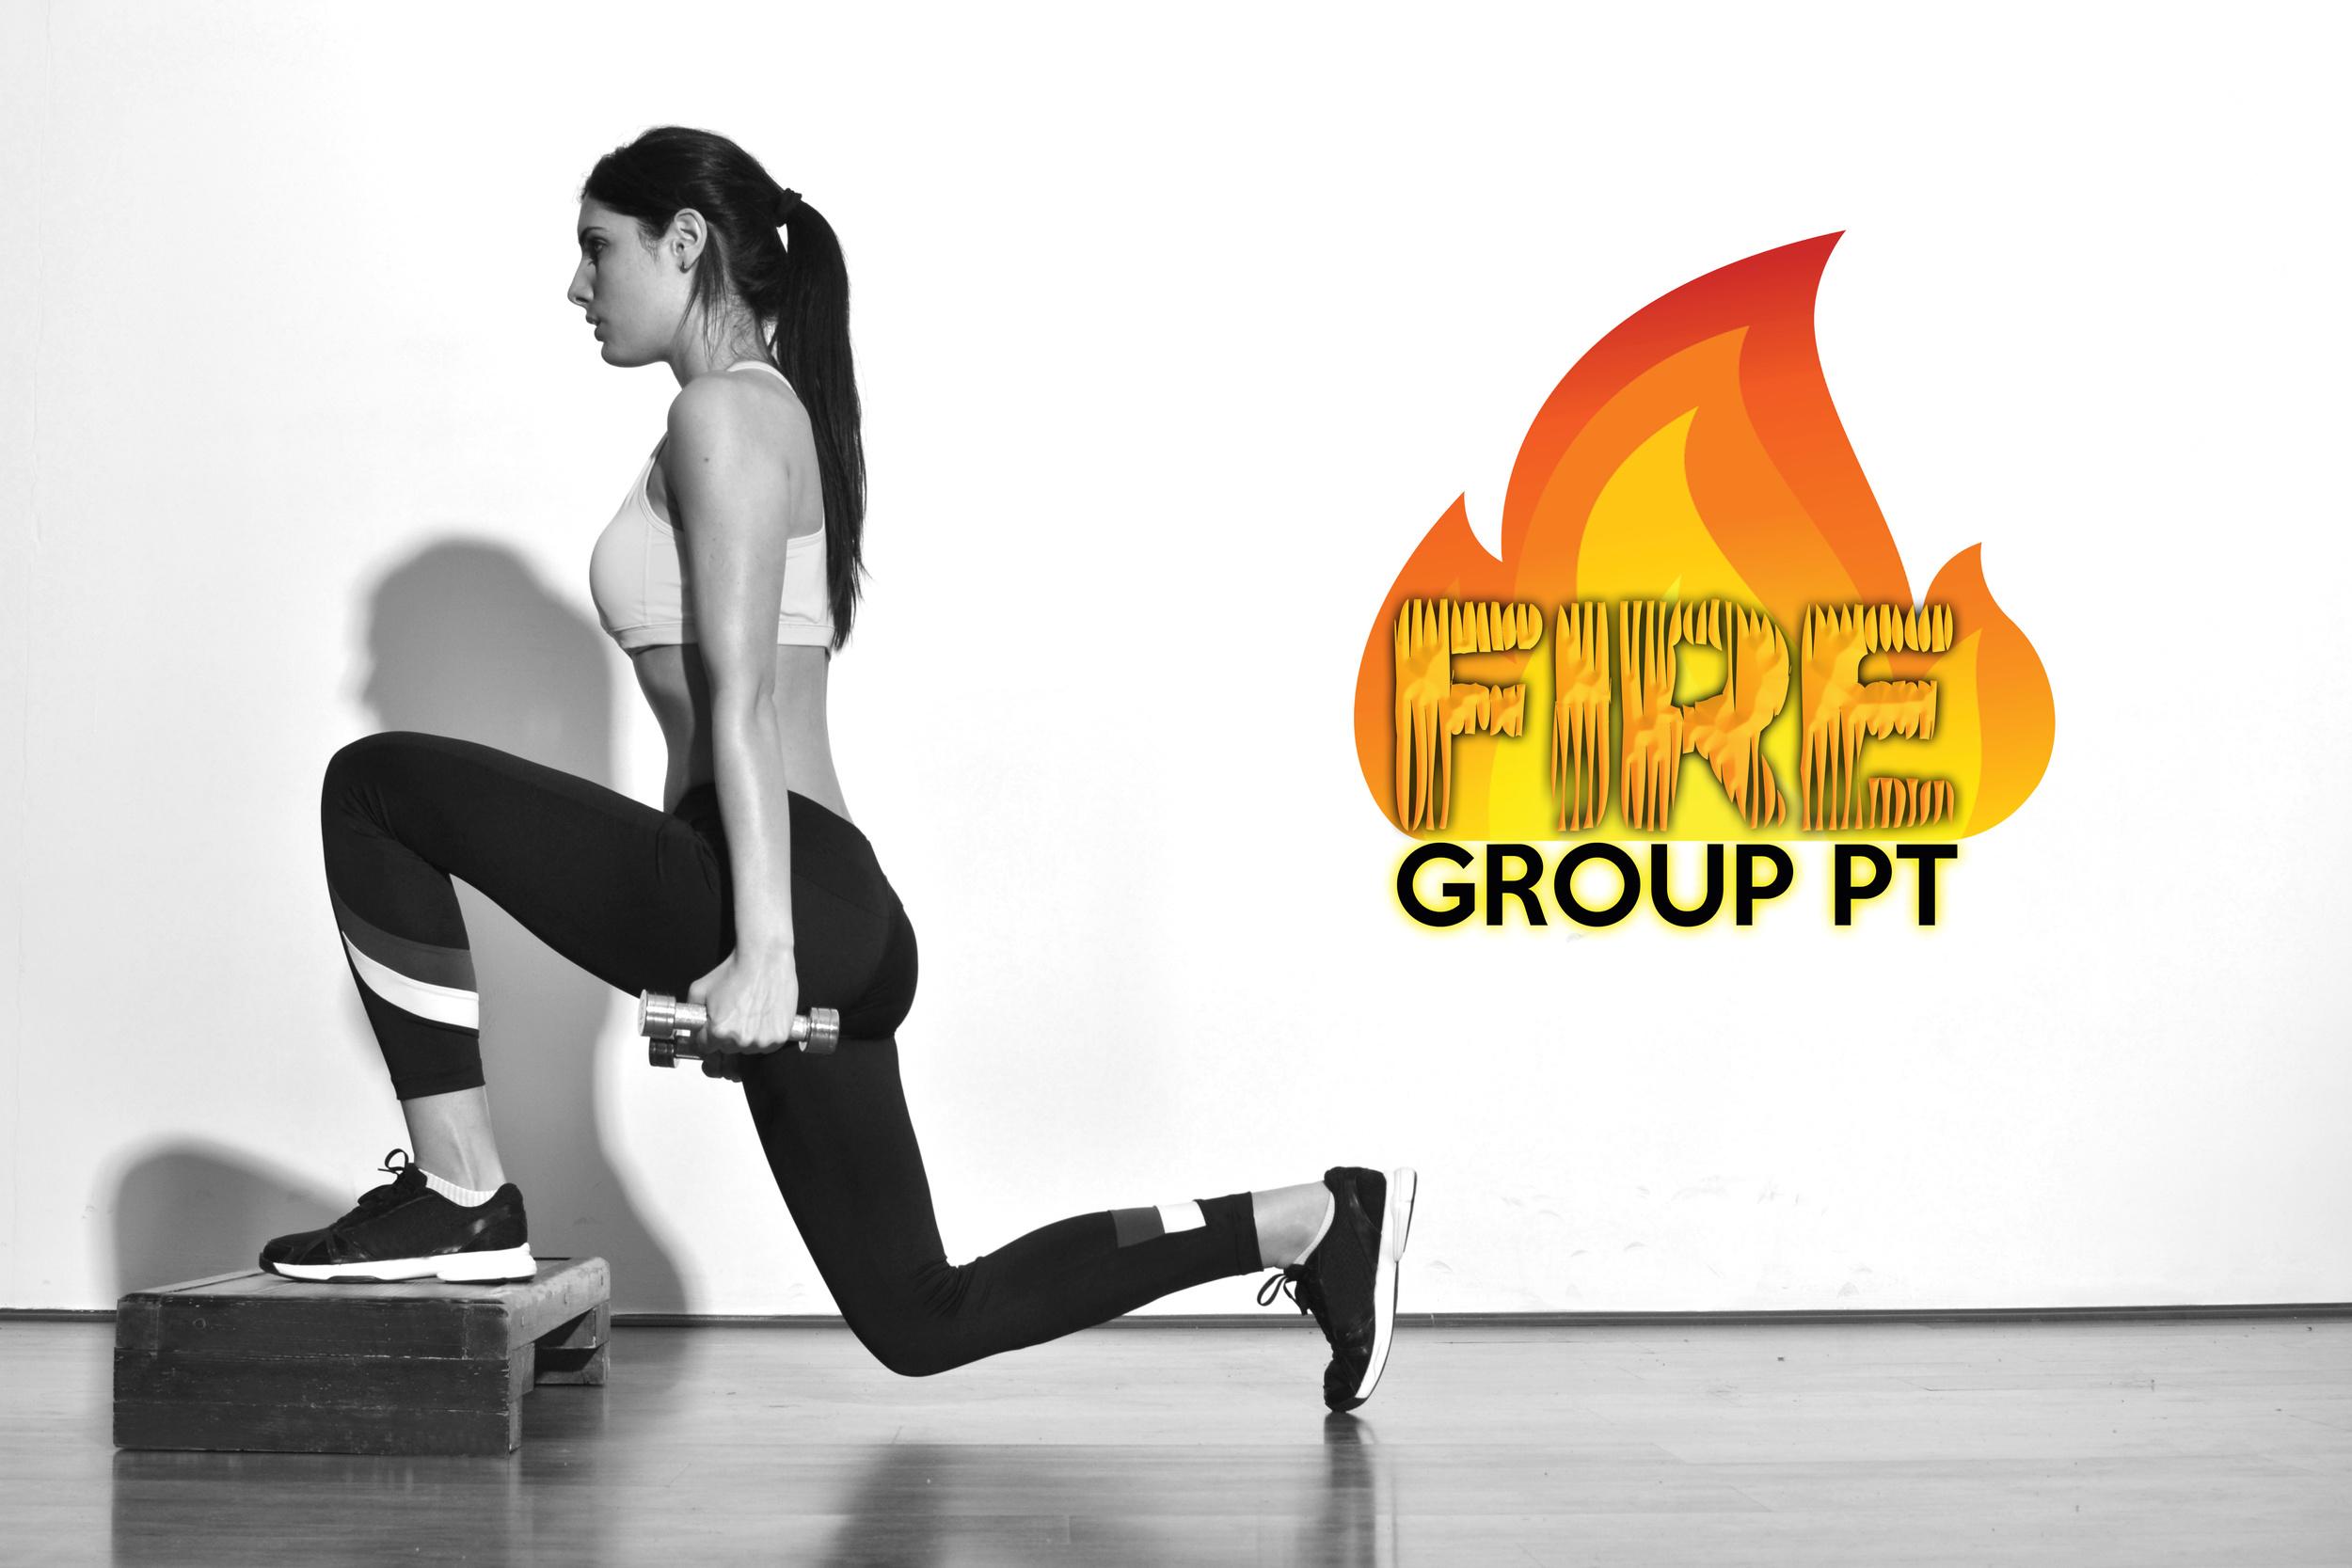 FIRE-GroupPT-pic-2.jpg